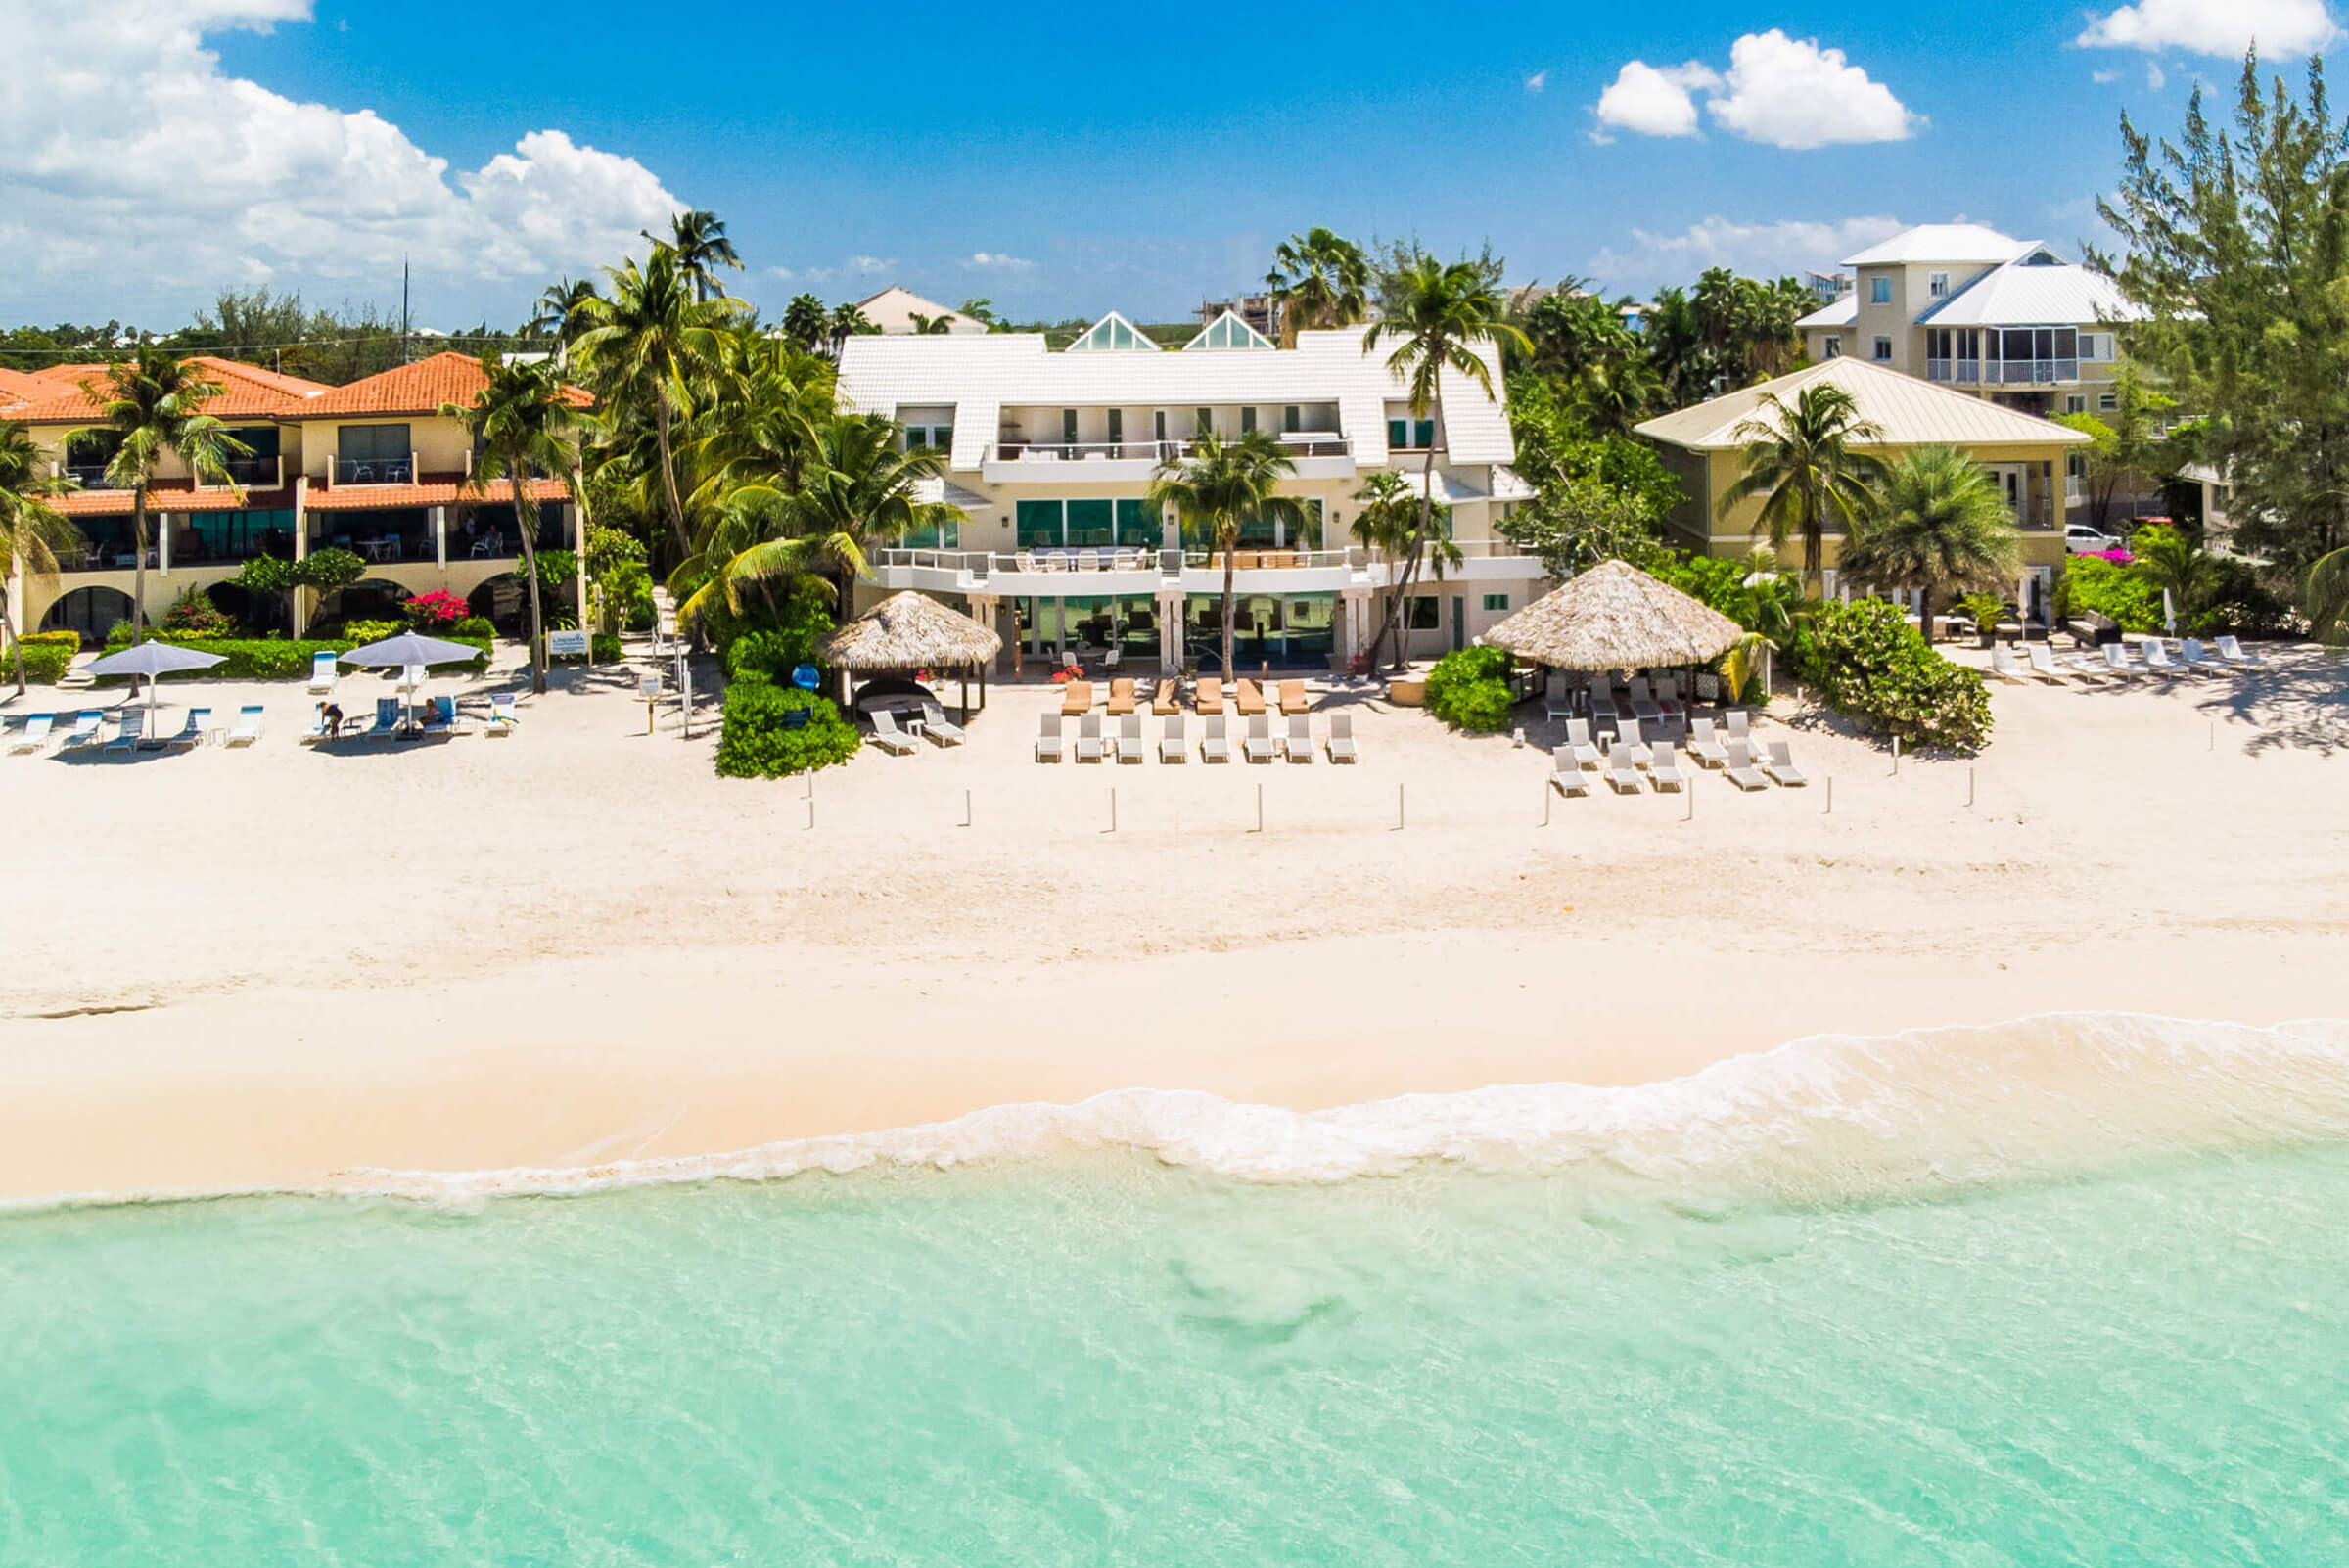 Seascape Villa Beach Villa Cayman Islands Grand Cayman Paradise Private Beachfront